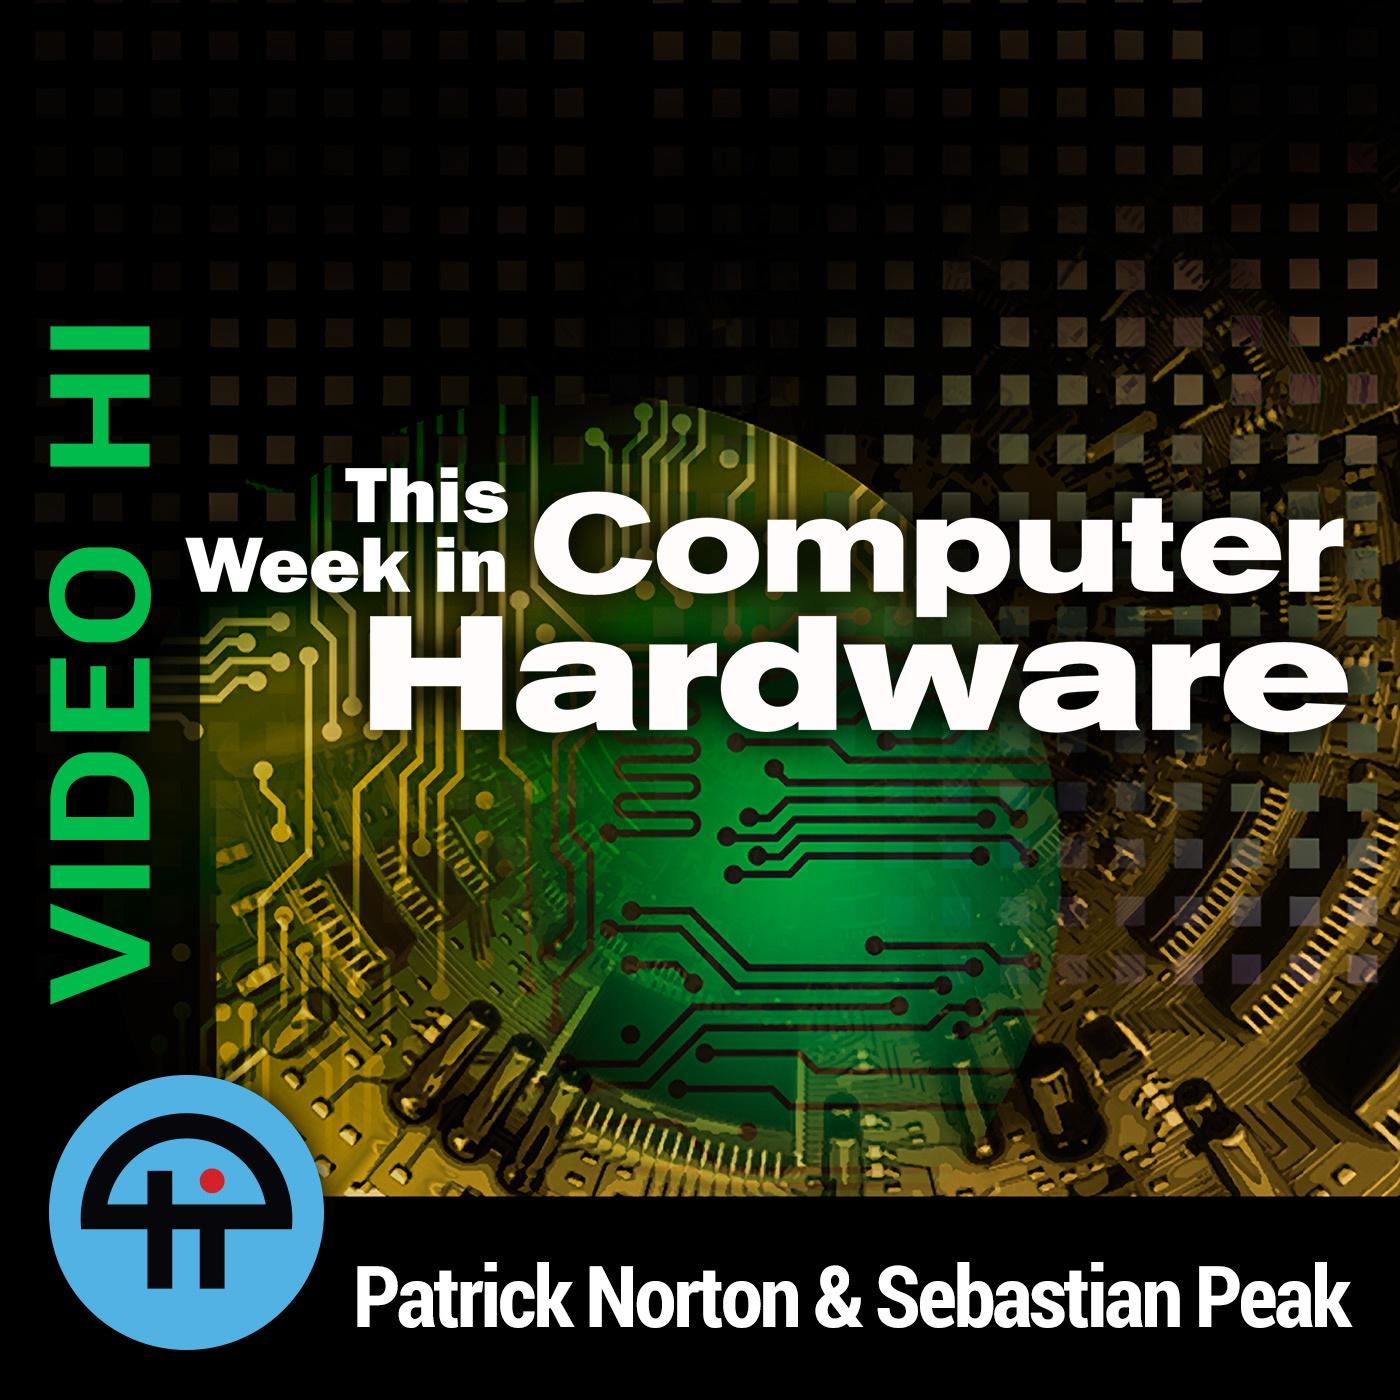 This Week in Computer Hardware (Video-HI)